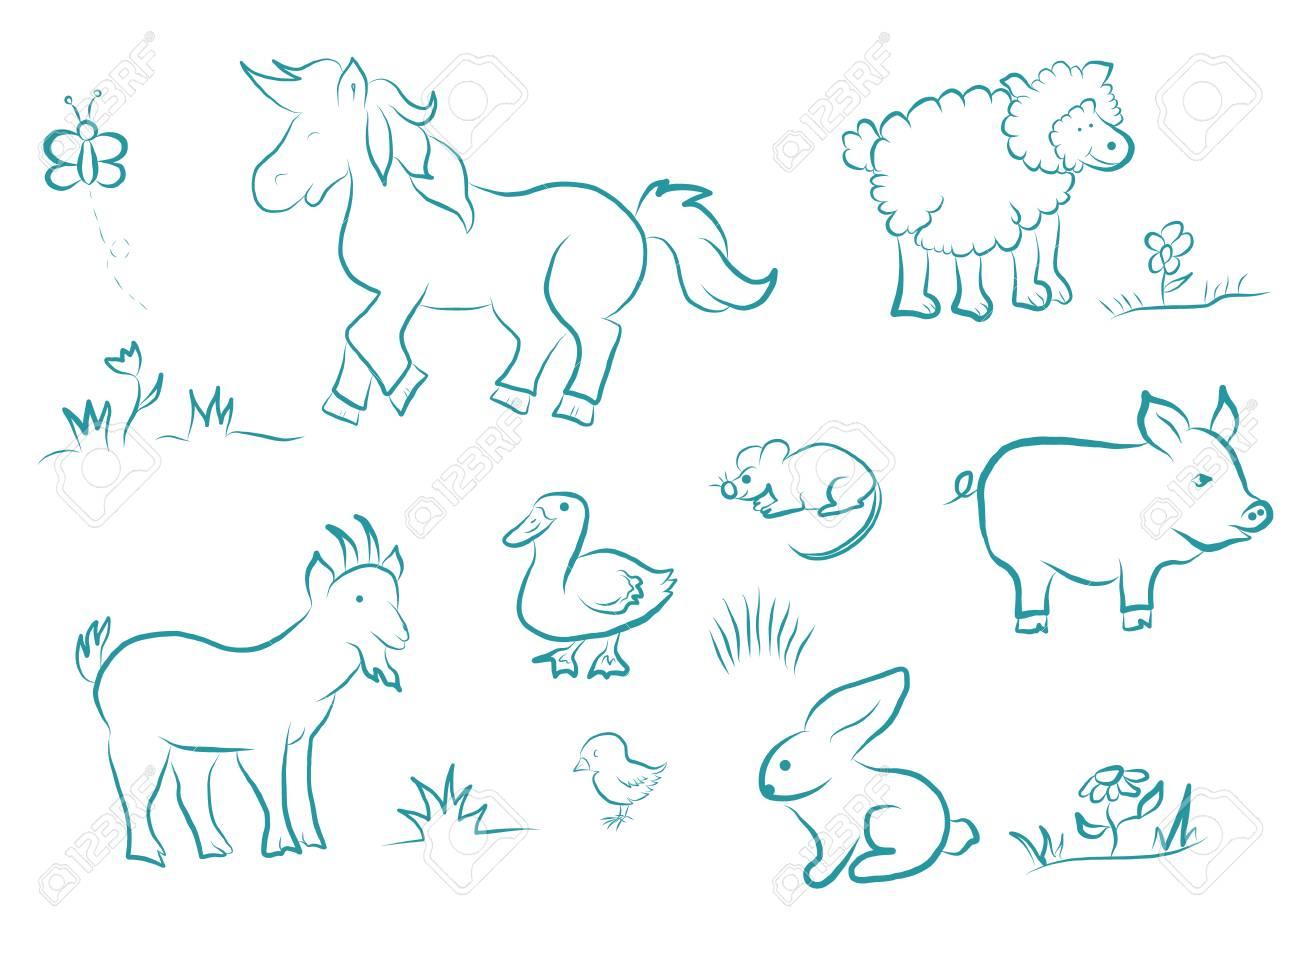 Funny Cartoon Set Of Farm Animals Cute Horse Sheep Pig Goat Royalty Free Cliparts Vectors And Stock Illustration Image 116789795